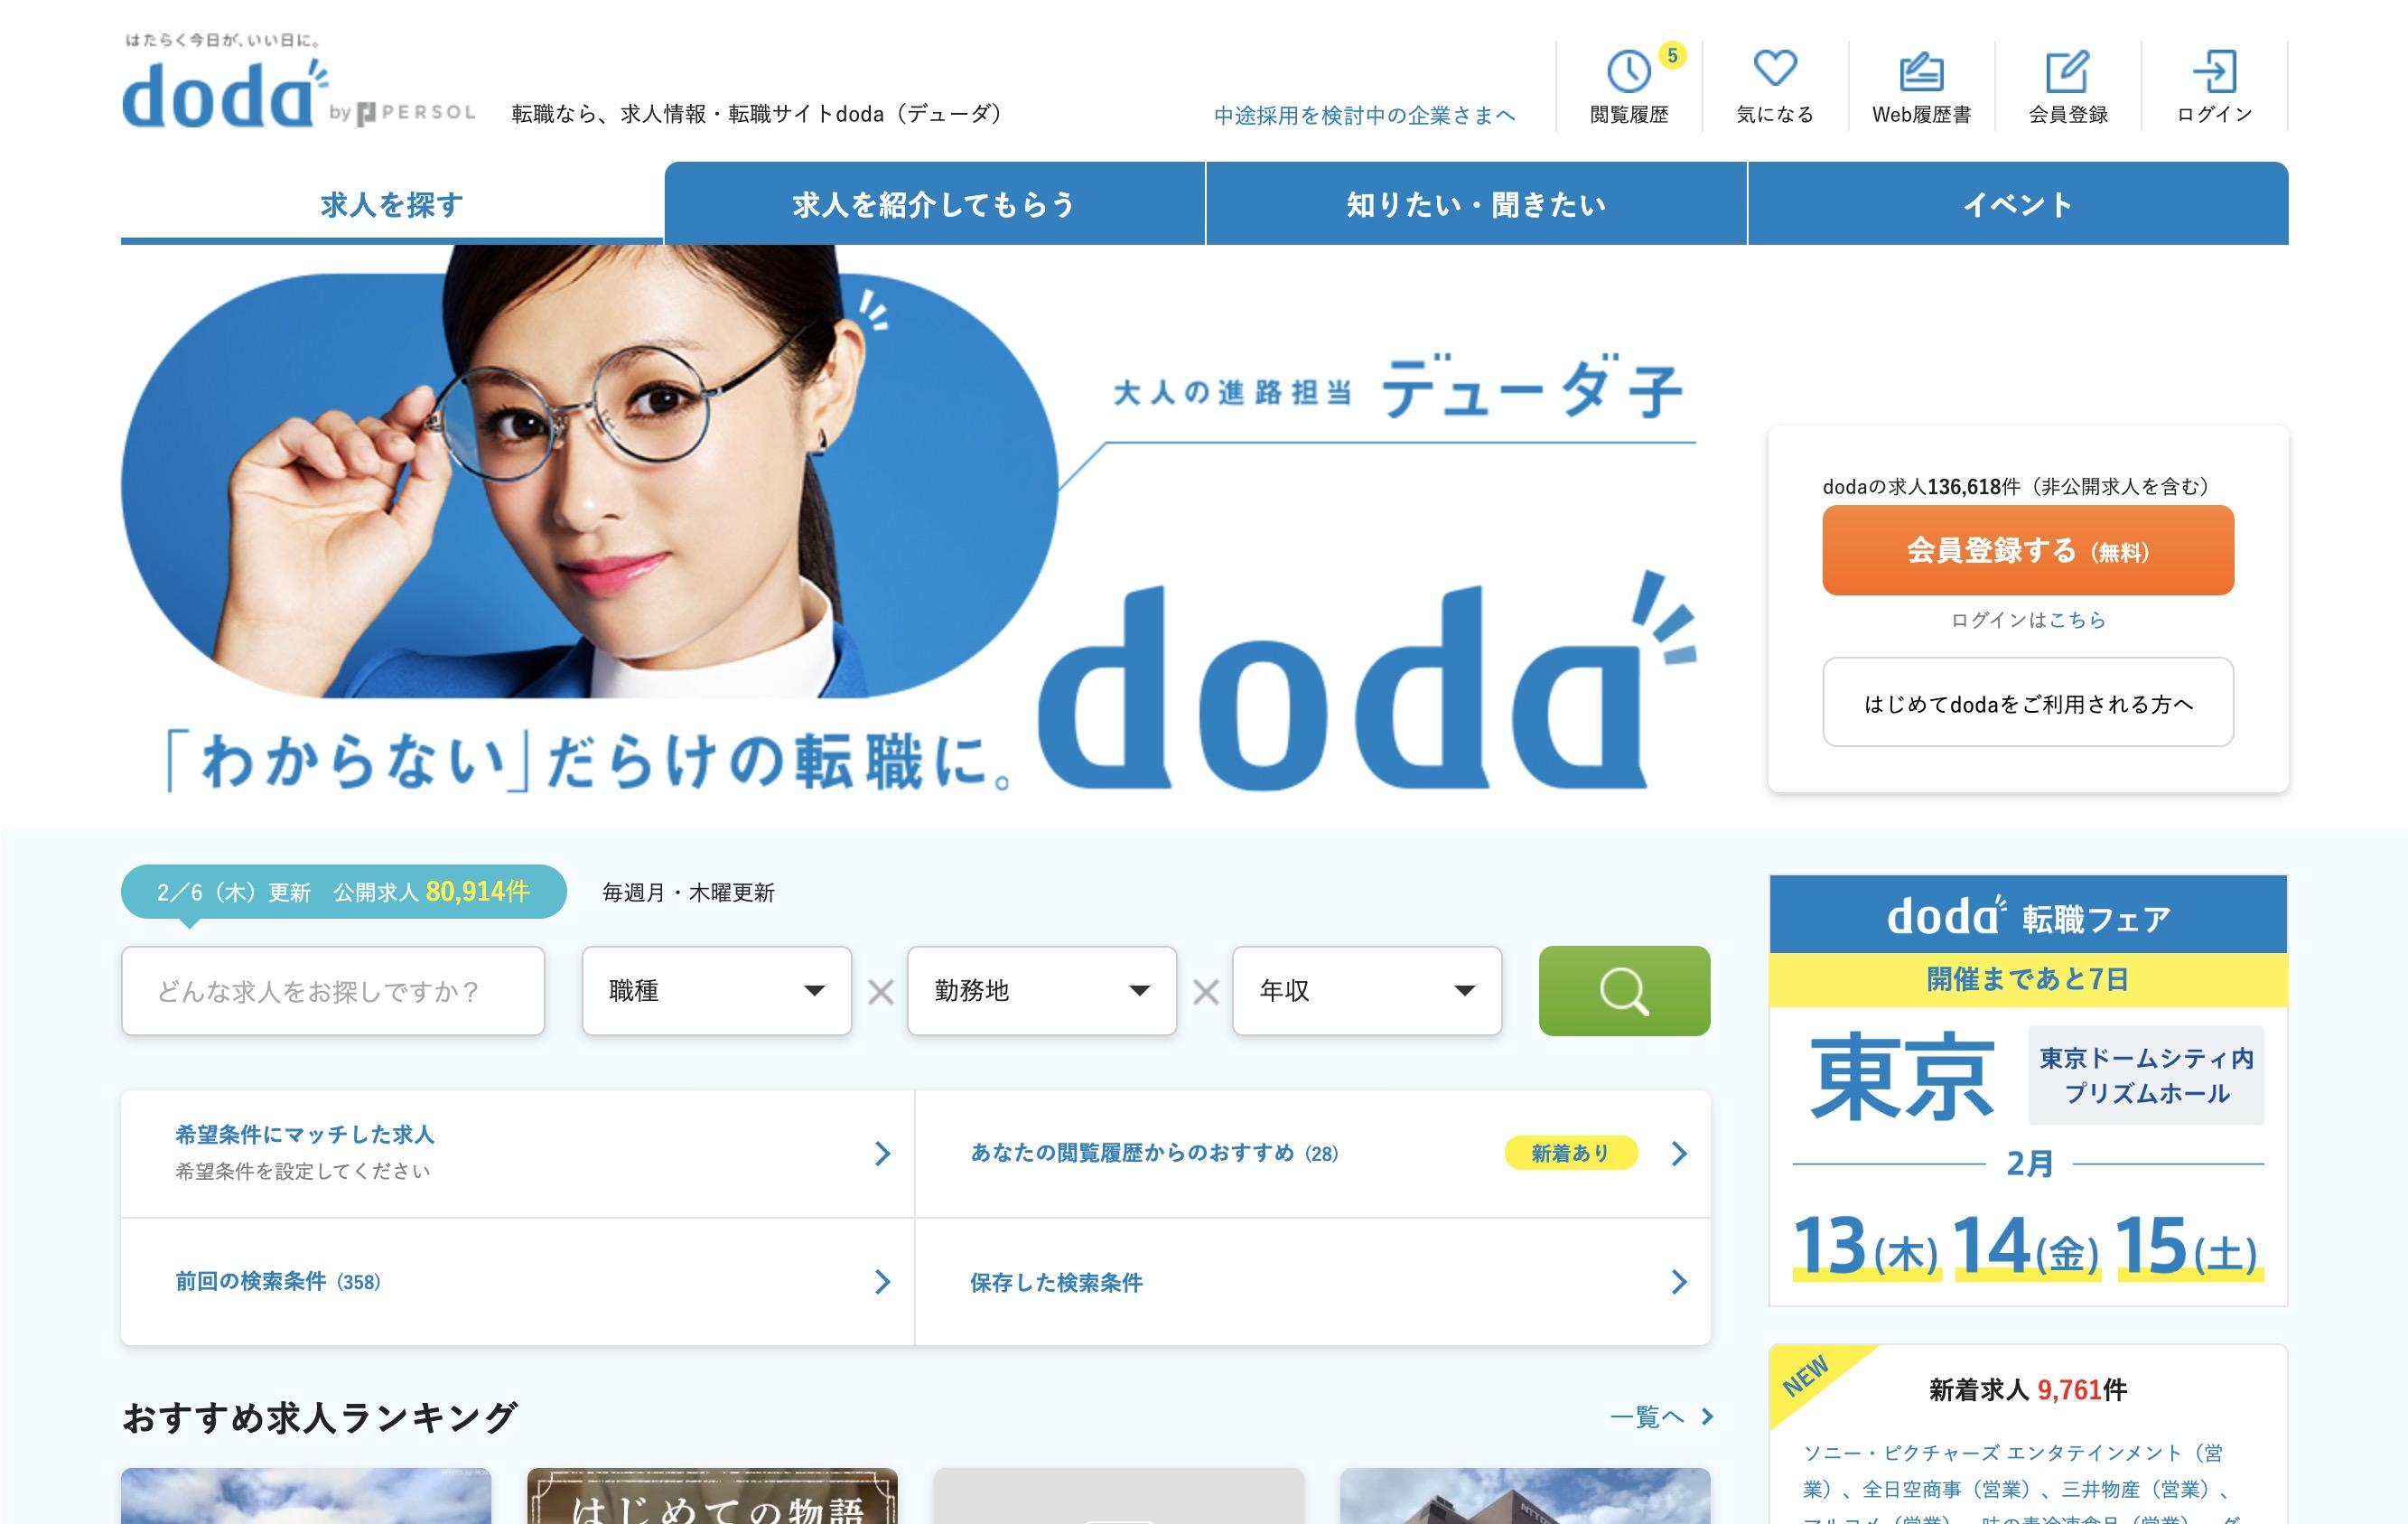 doda (デューダ)